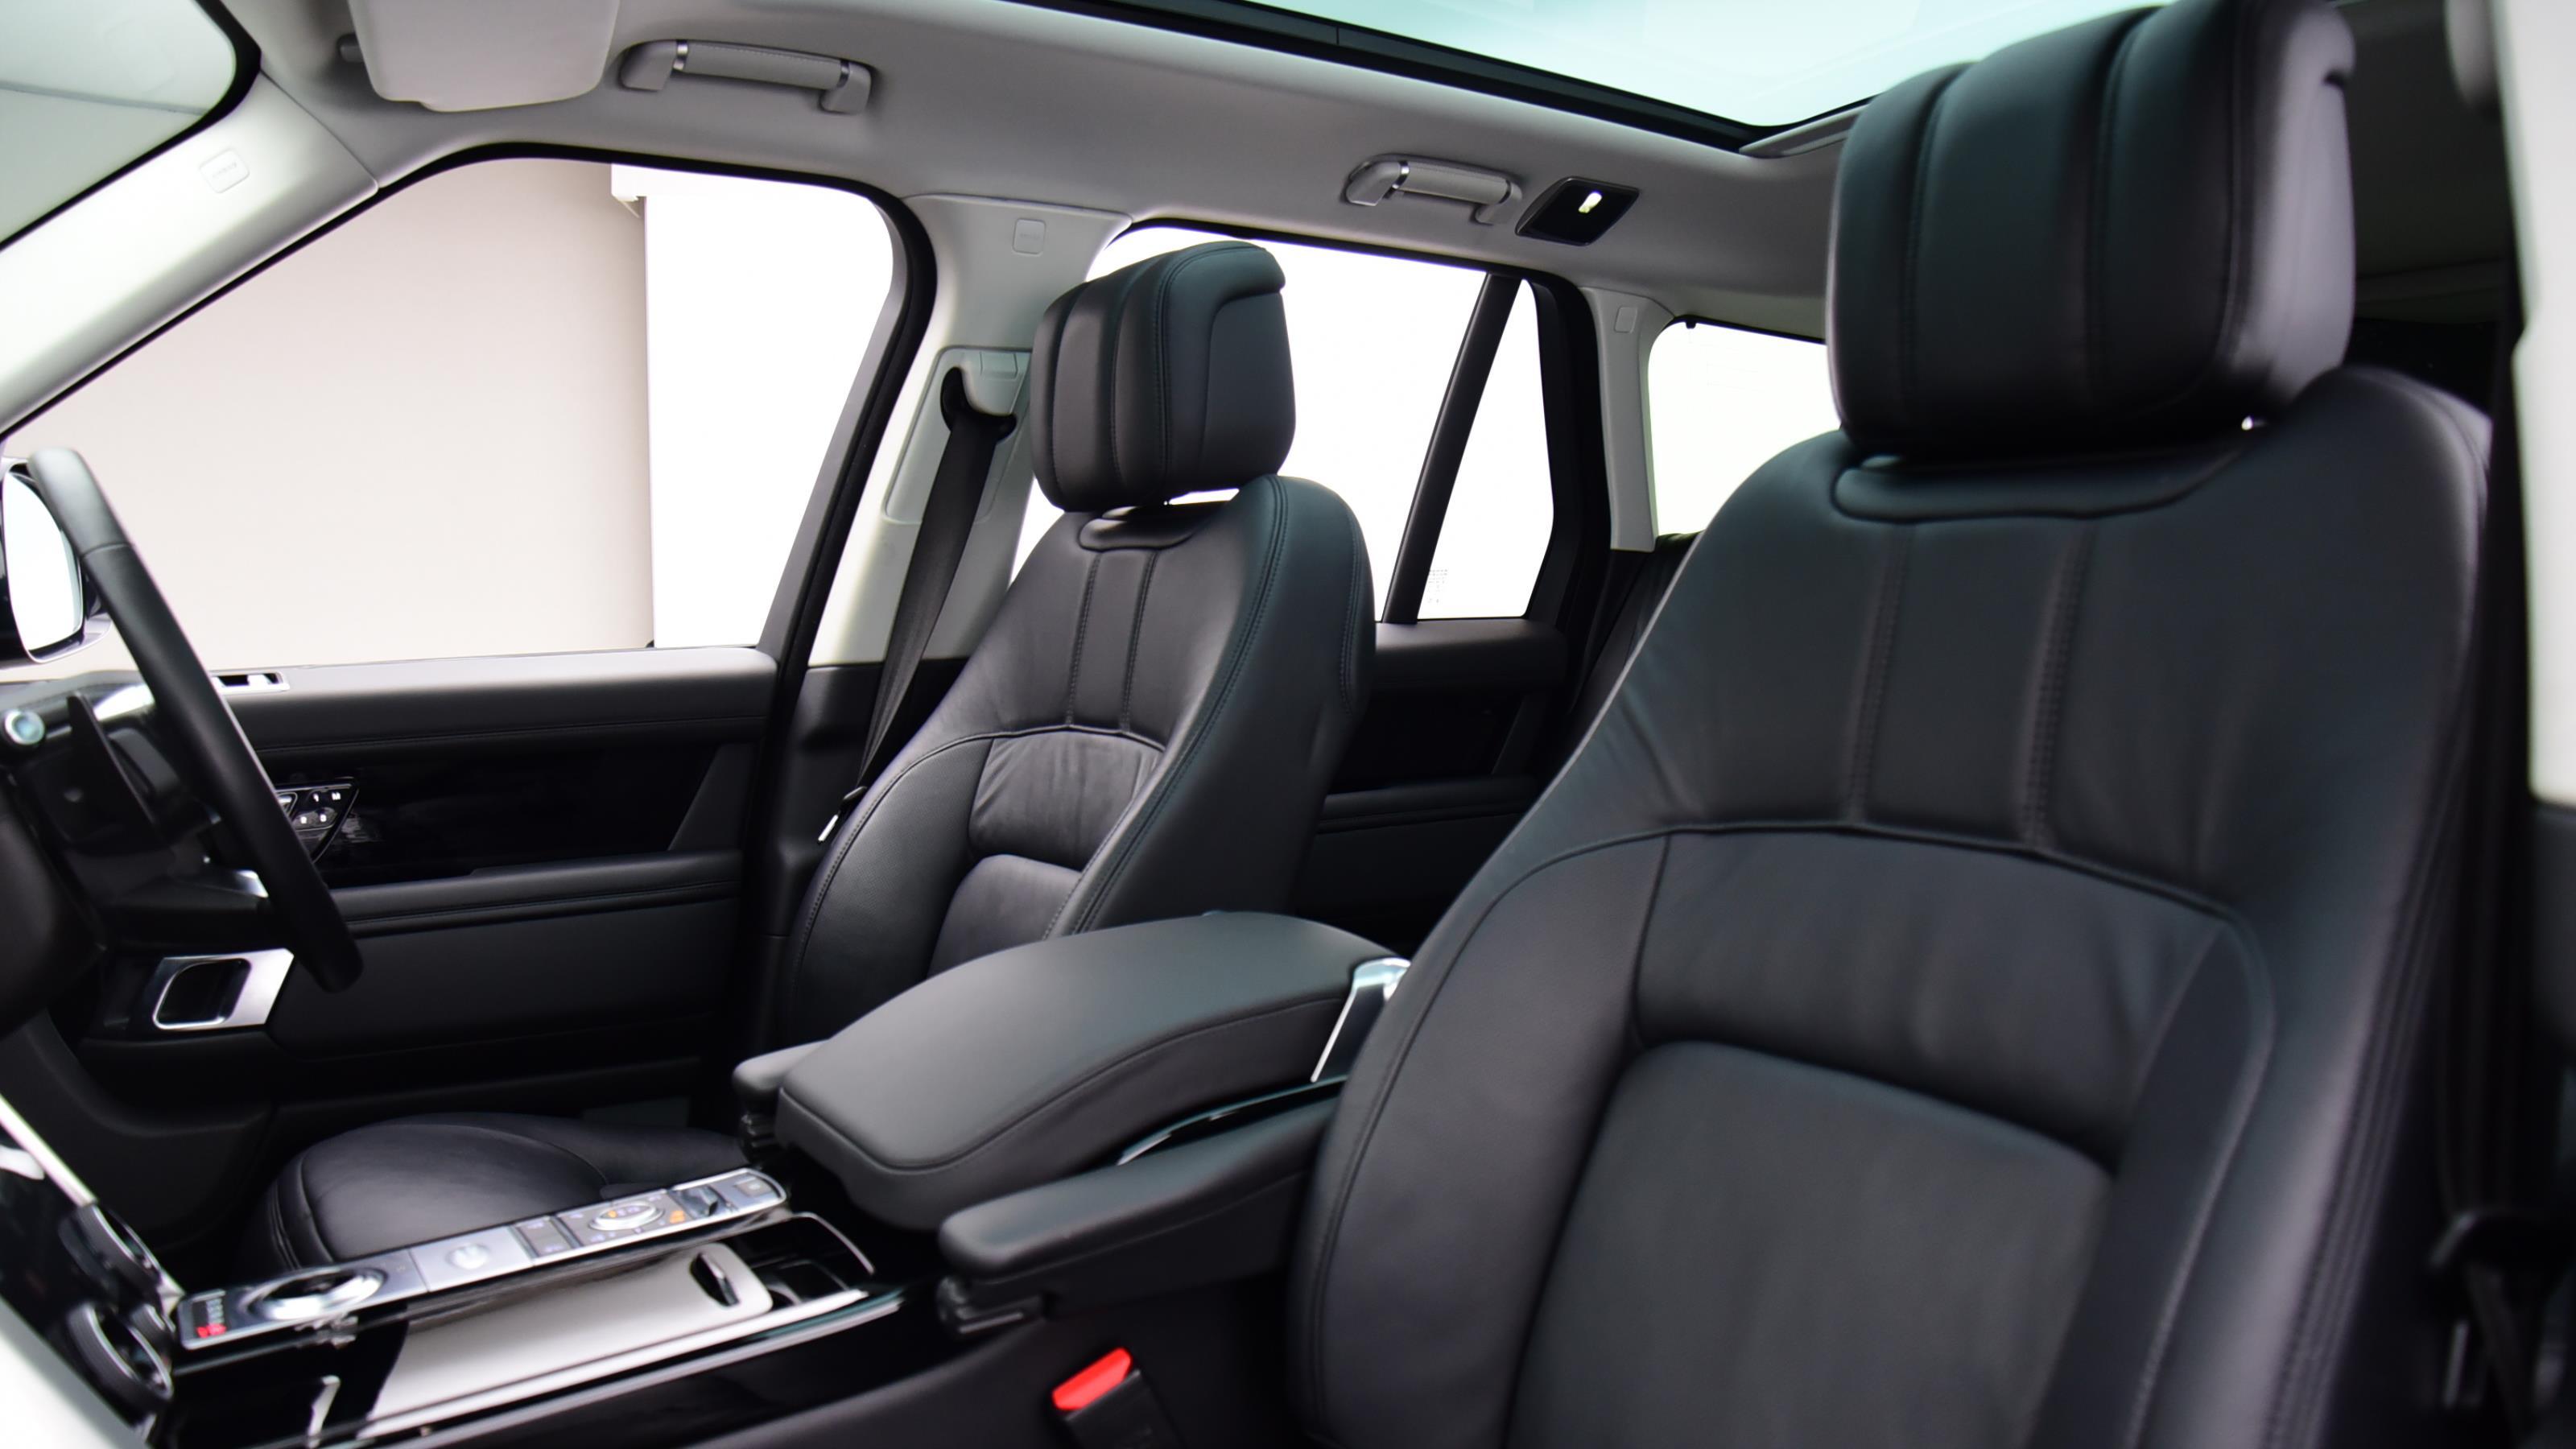 Used 2019 Land Rover RANGE ROVER 3.0 SDV6 Vogue SE 4dr Auto BLACK at Saxton4x4